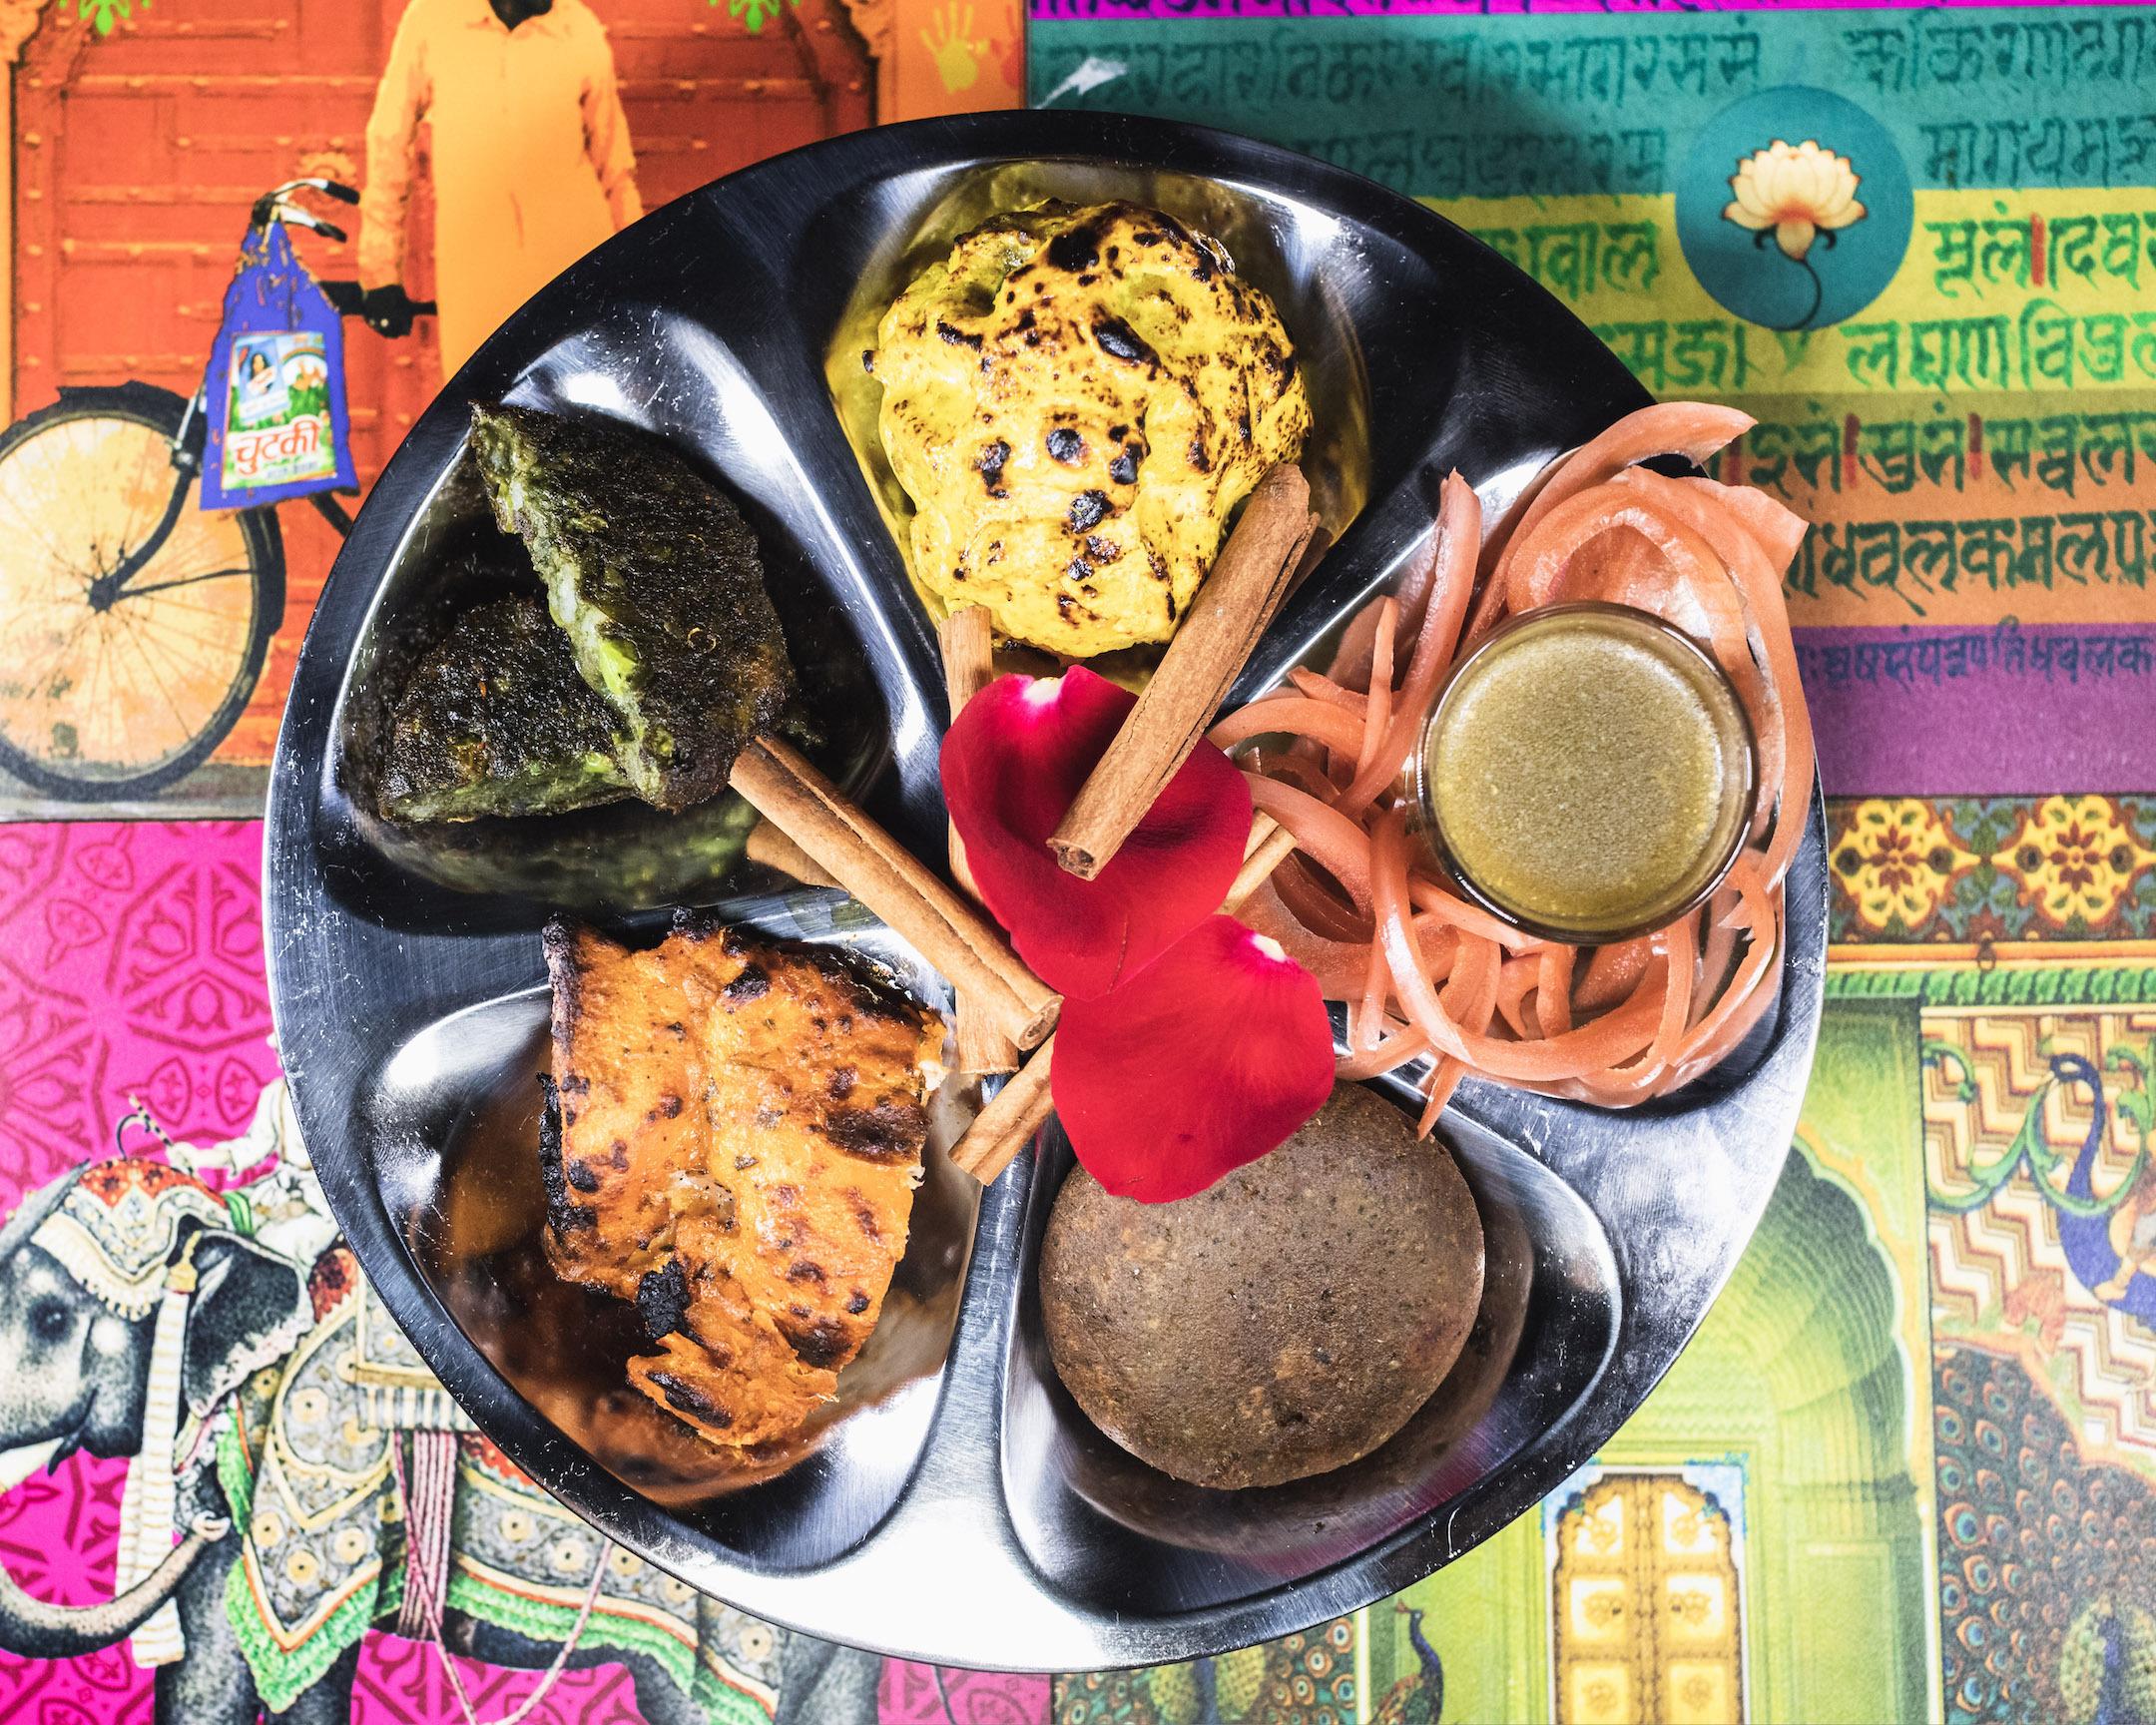 The 14 best Indian restaurants in Chicago